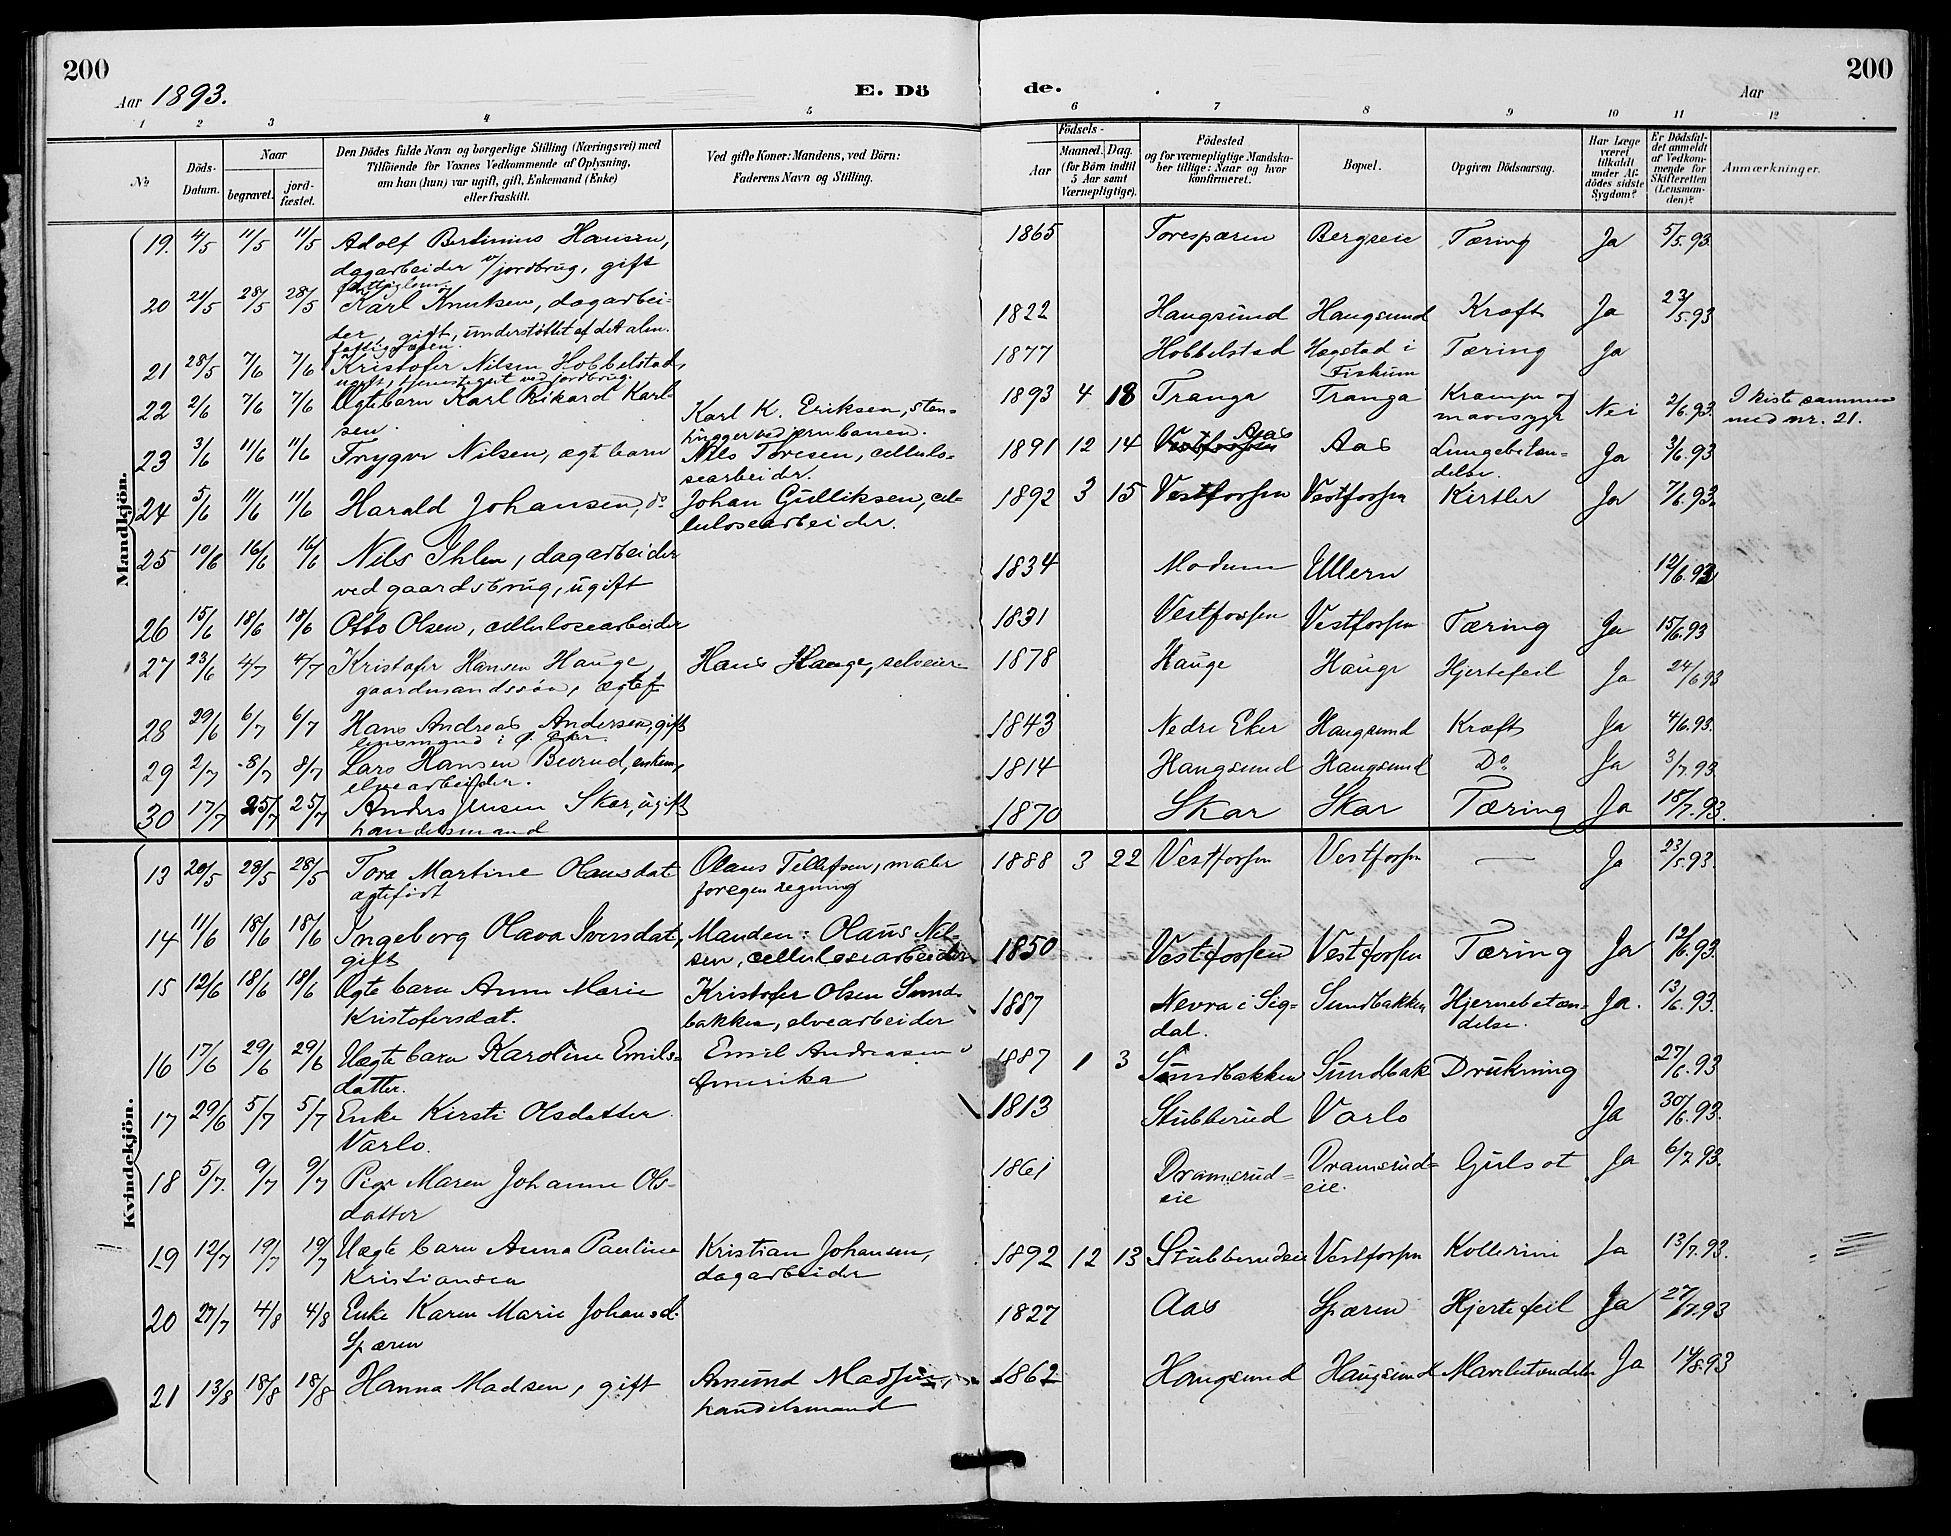 SAKO, Eiker kirkebøker, G/Ga/L0007: Parish register (copy) no. I 7, 1893-1902, p. 200